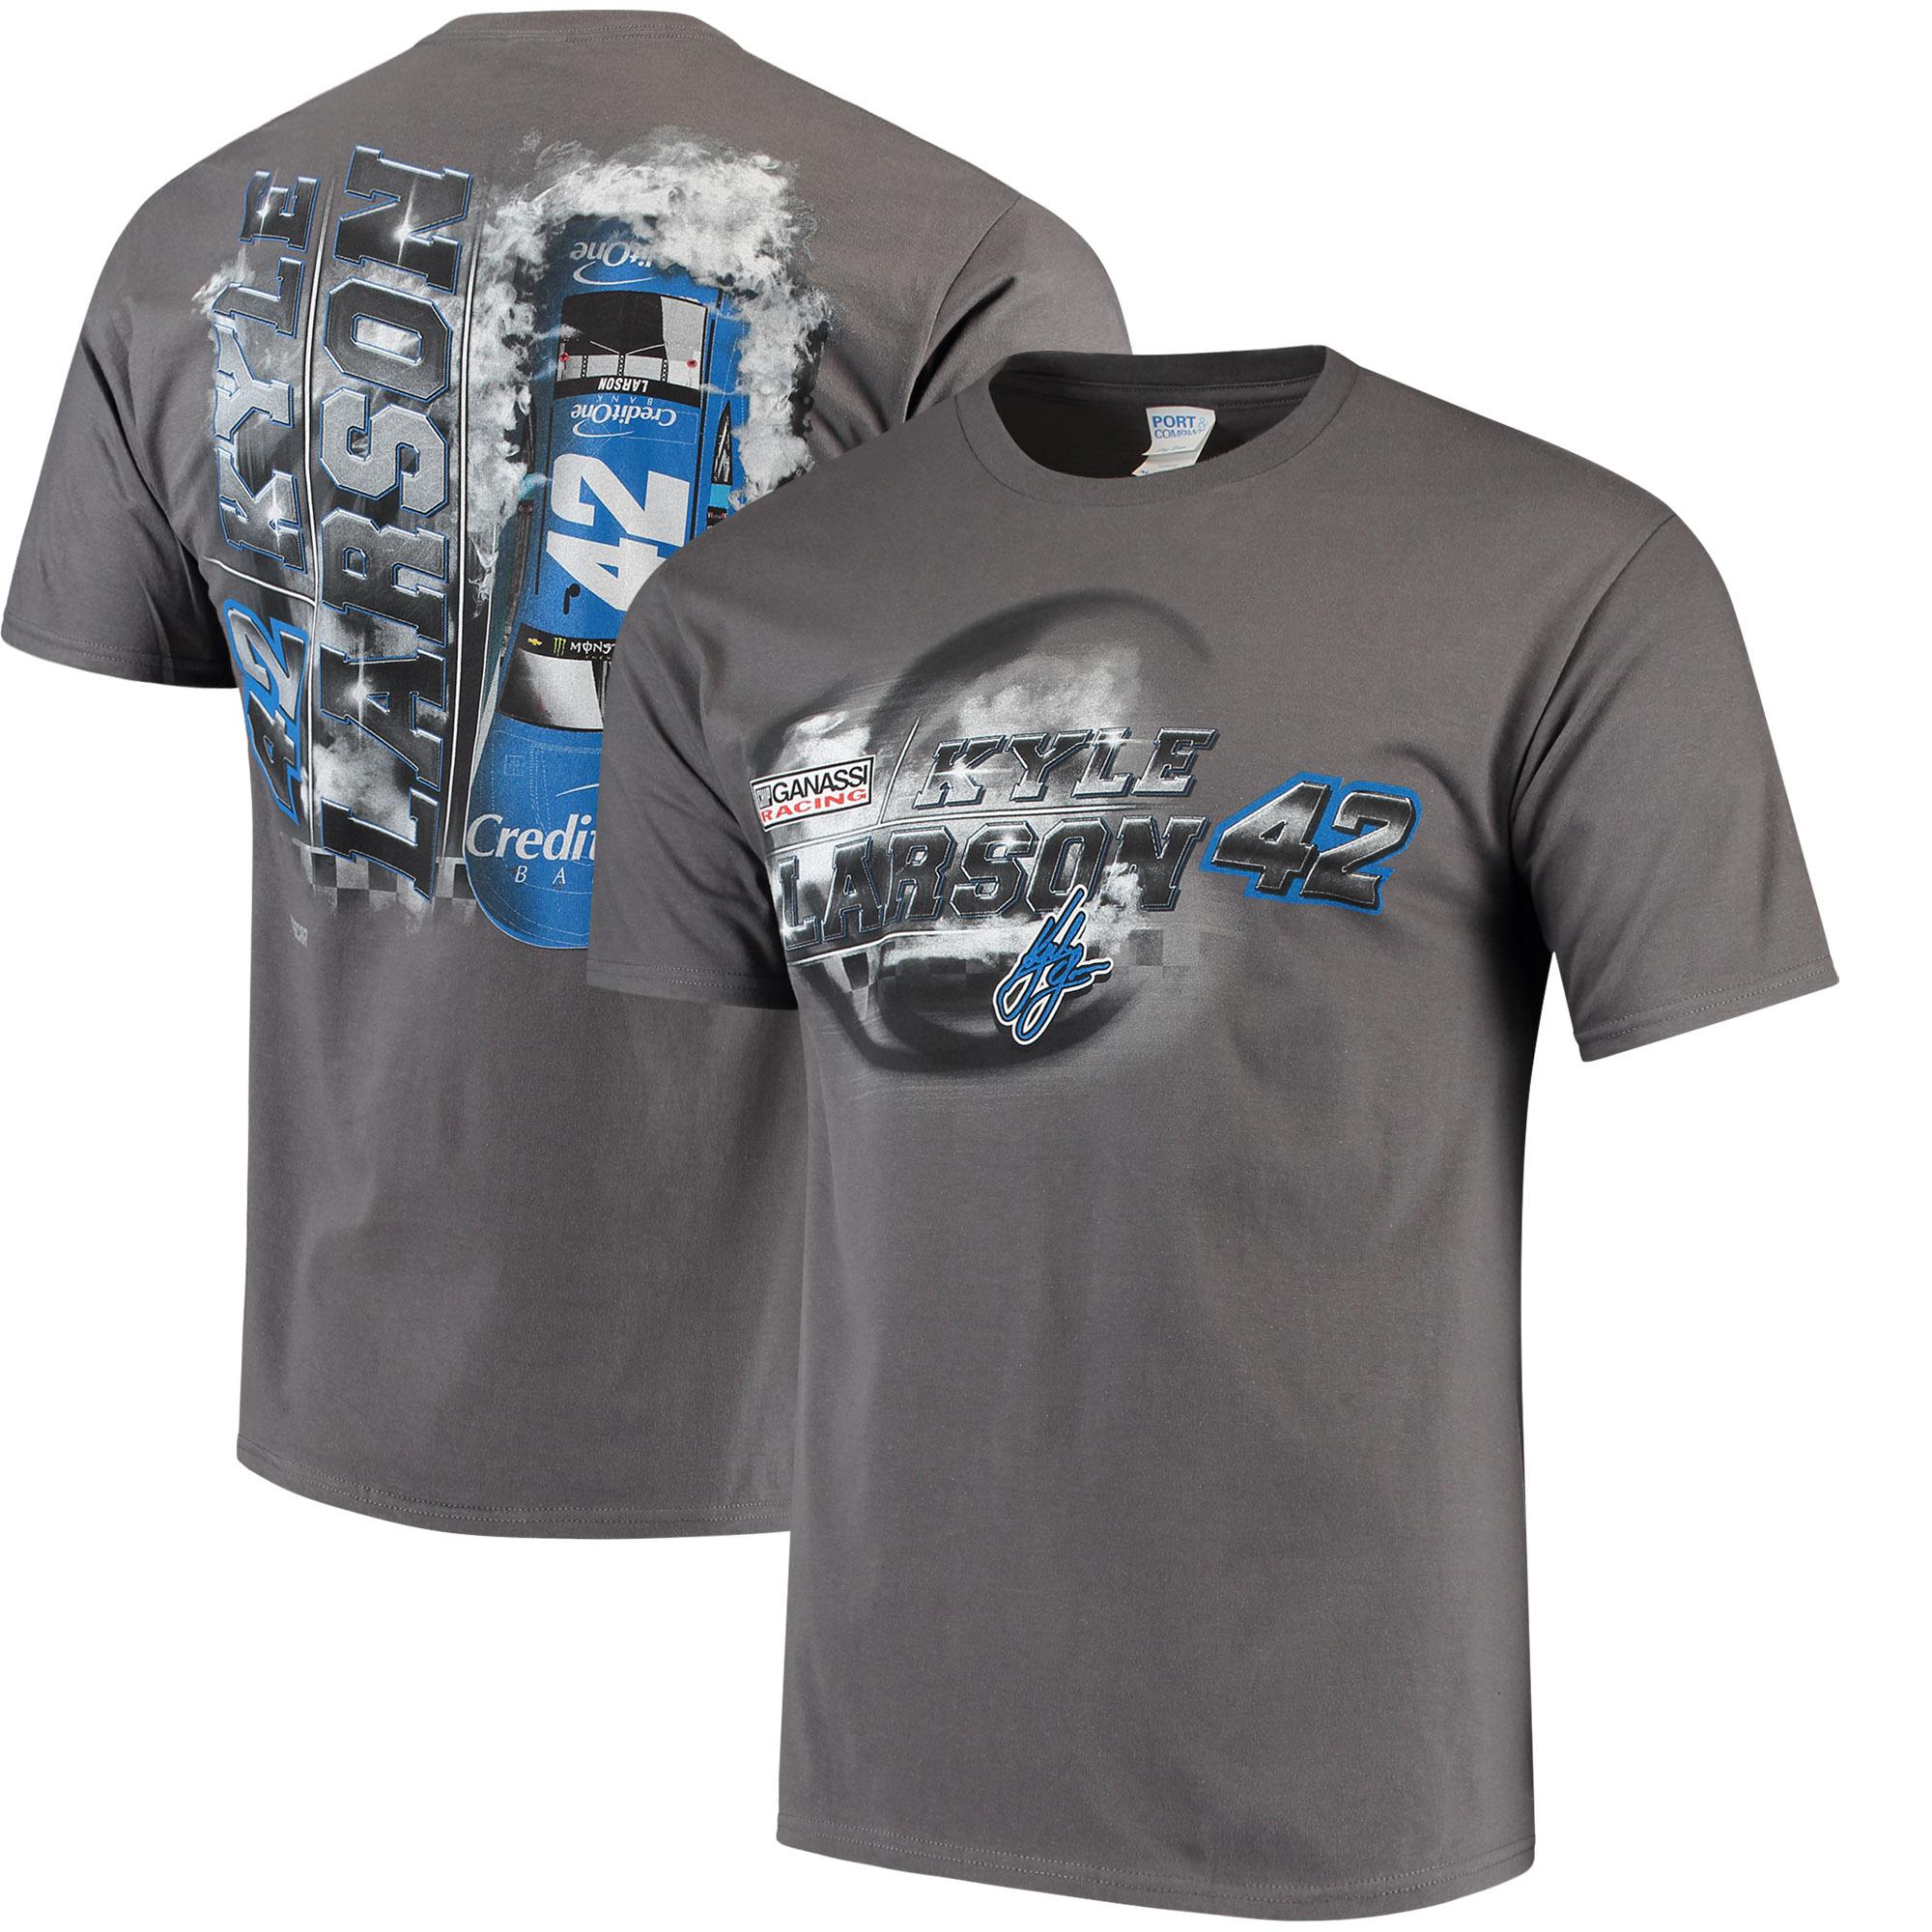 Kyle Larson Steel Thunder Logo T-Shirt - Charcoal